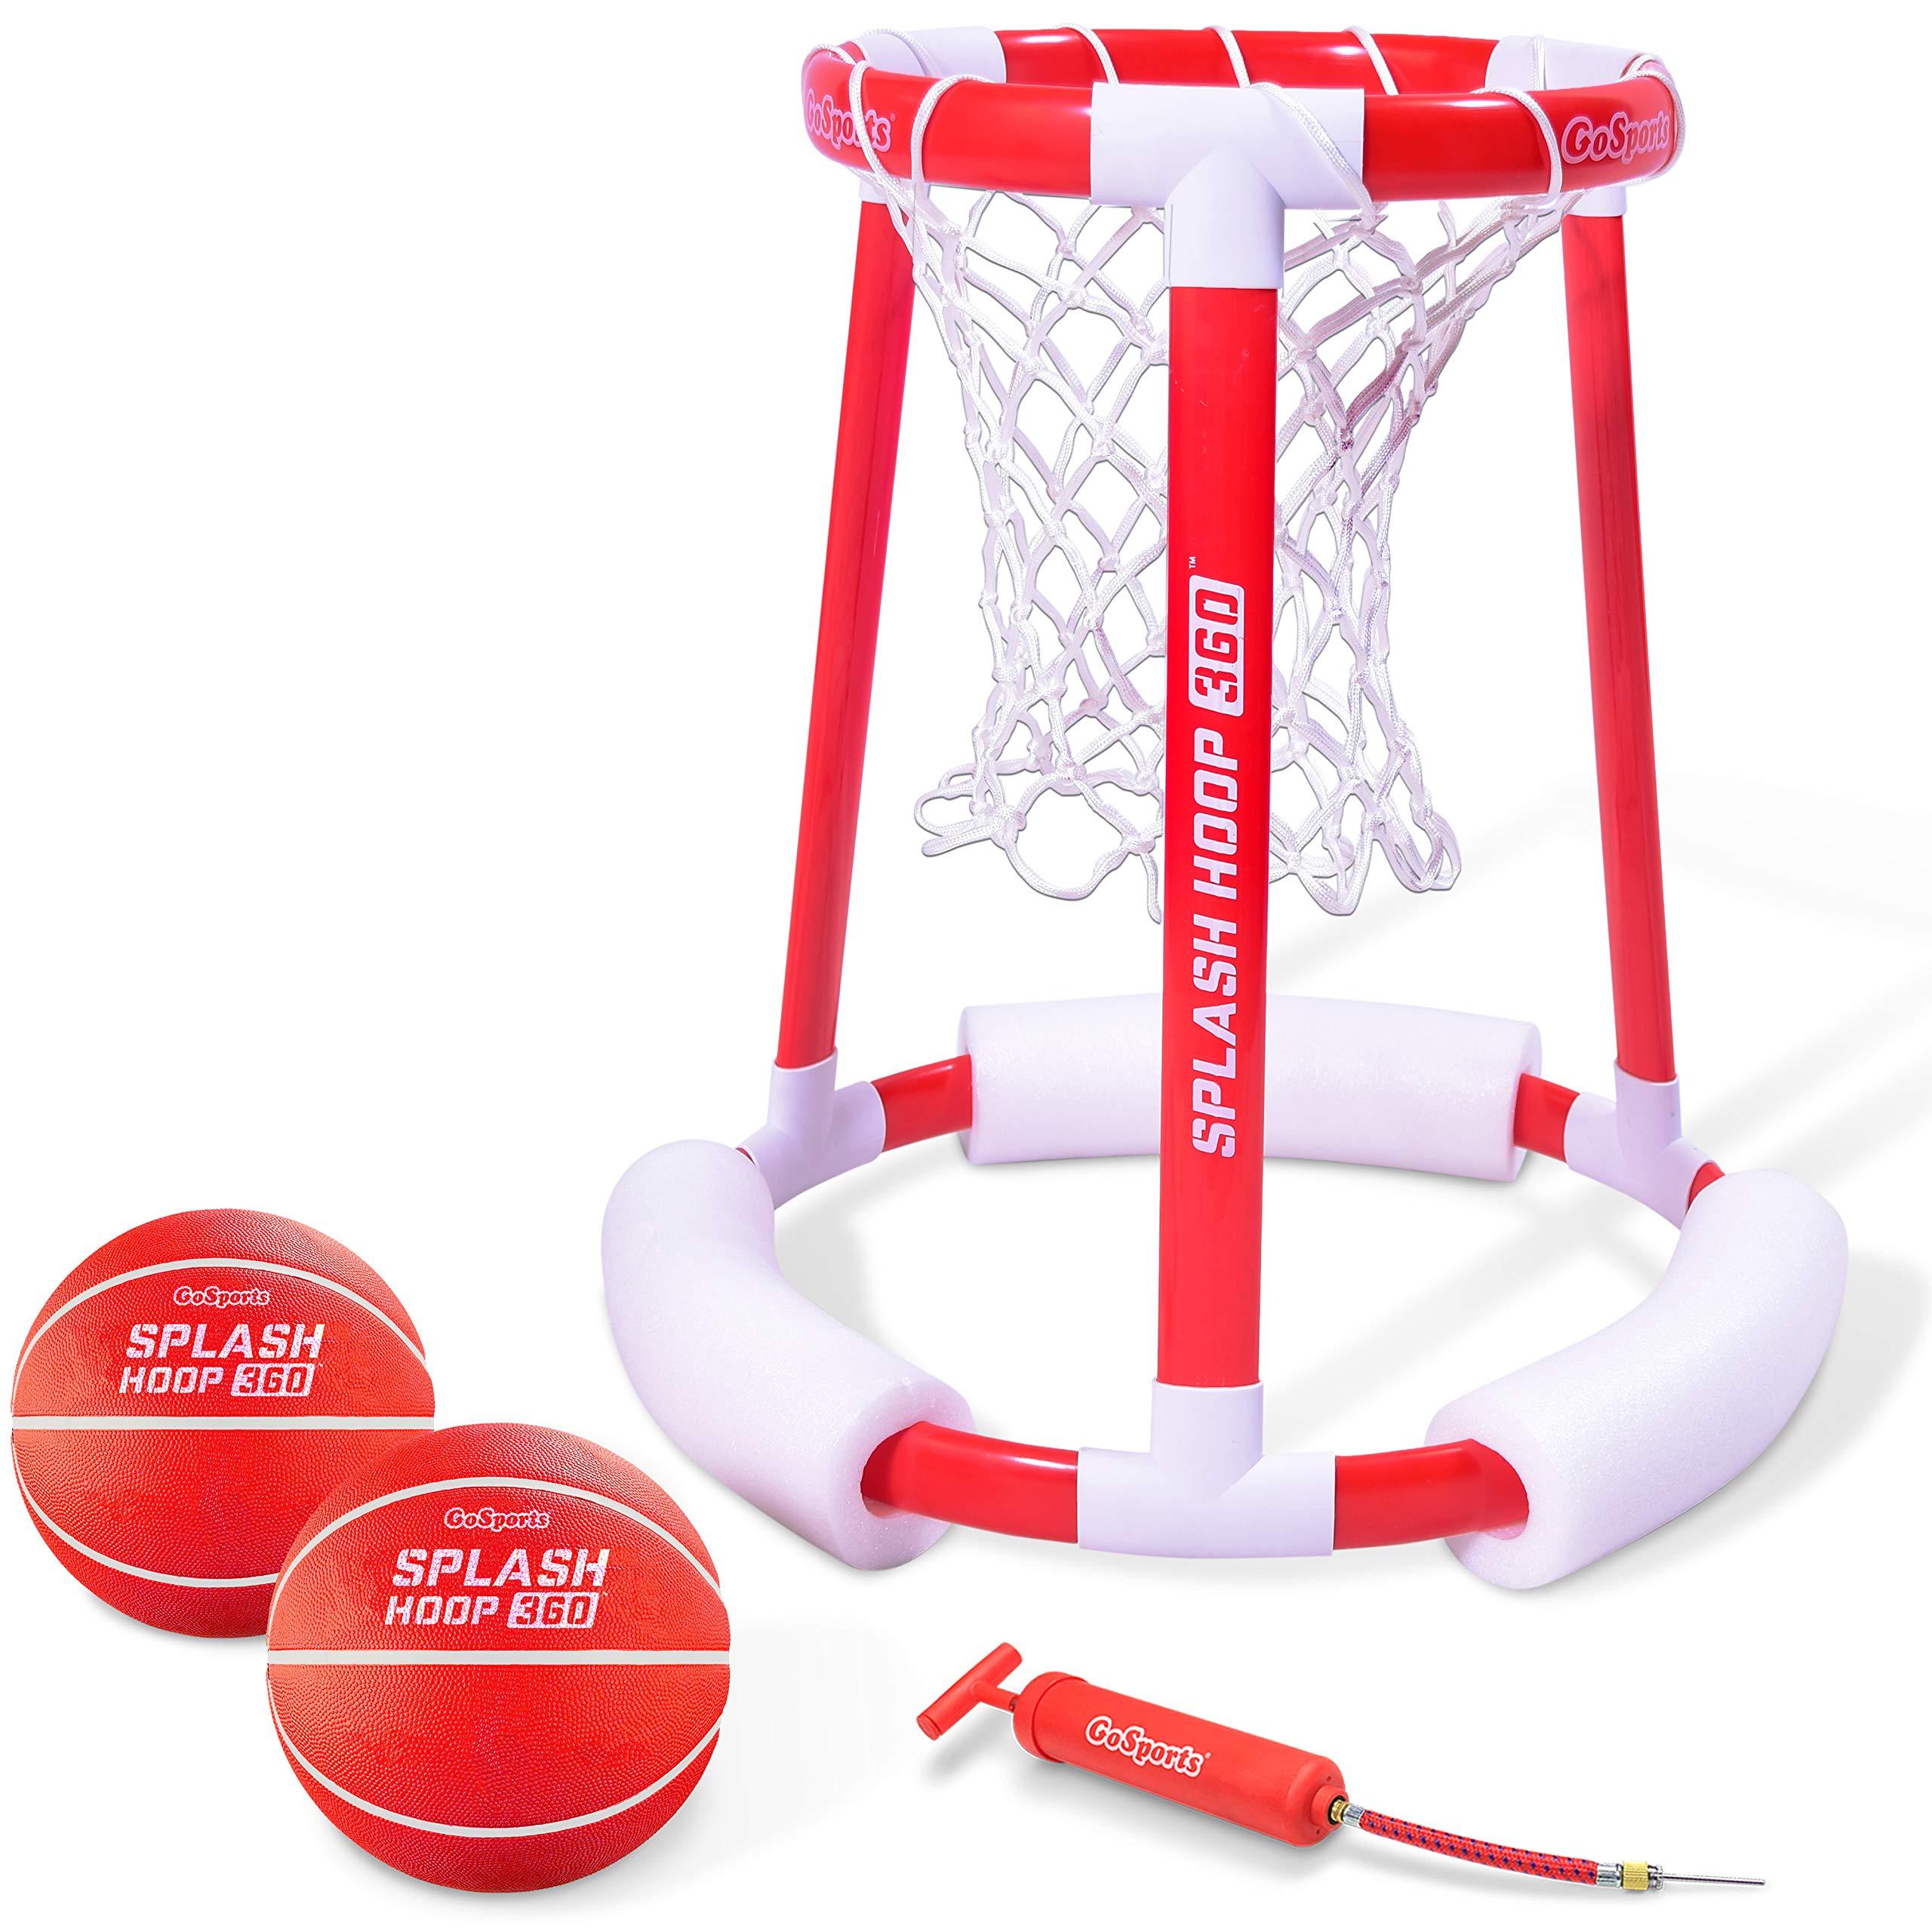 GoSports Splash Hoop 360 Floating Pool Basketball Game | Includes Water Basketball Hoop, 2 Balls and Pump by GoSports